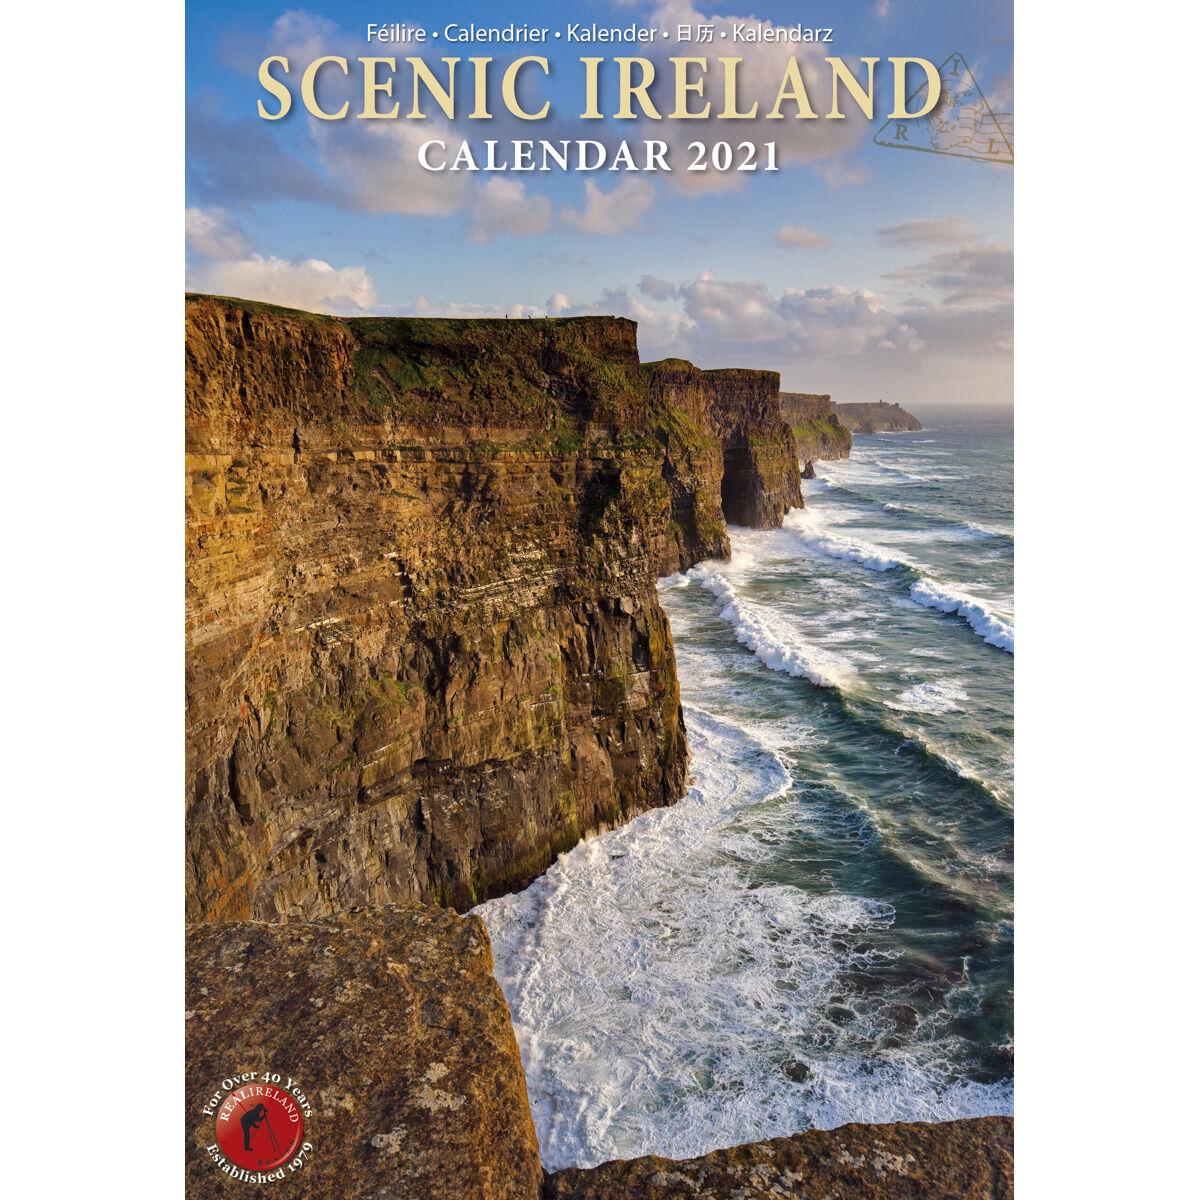 Buy Slim Scenic Image of Ireland 2021 Calendar by Liam Blake